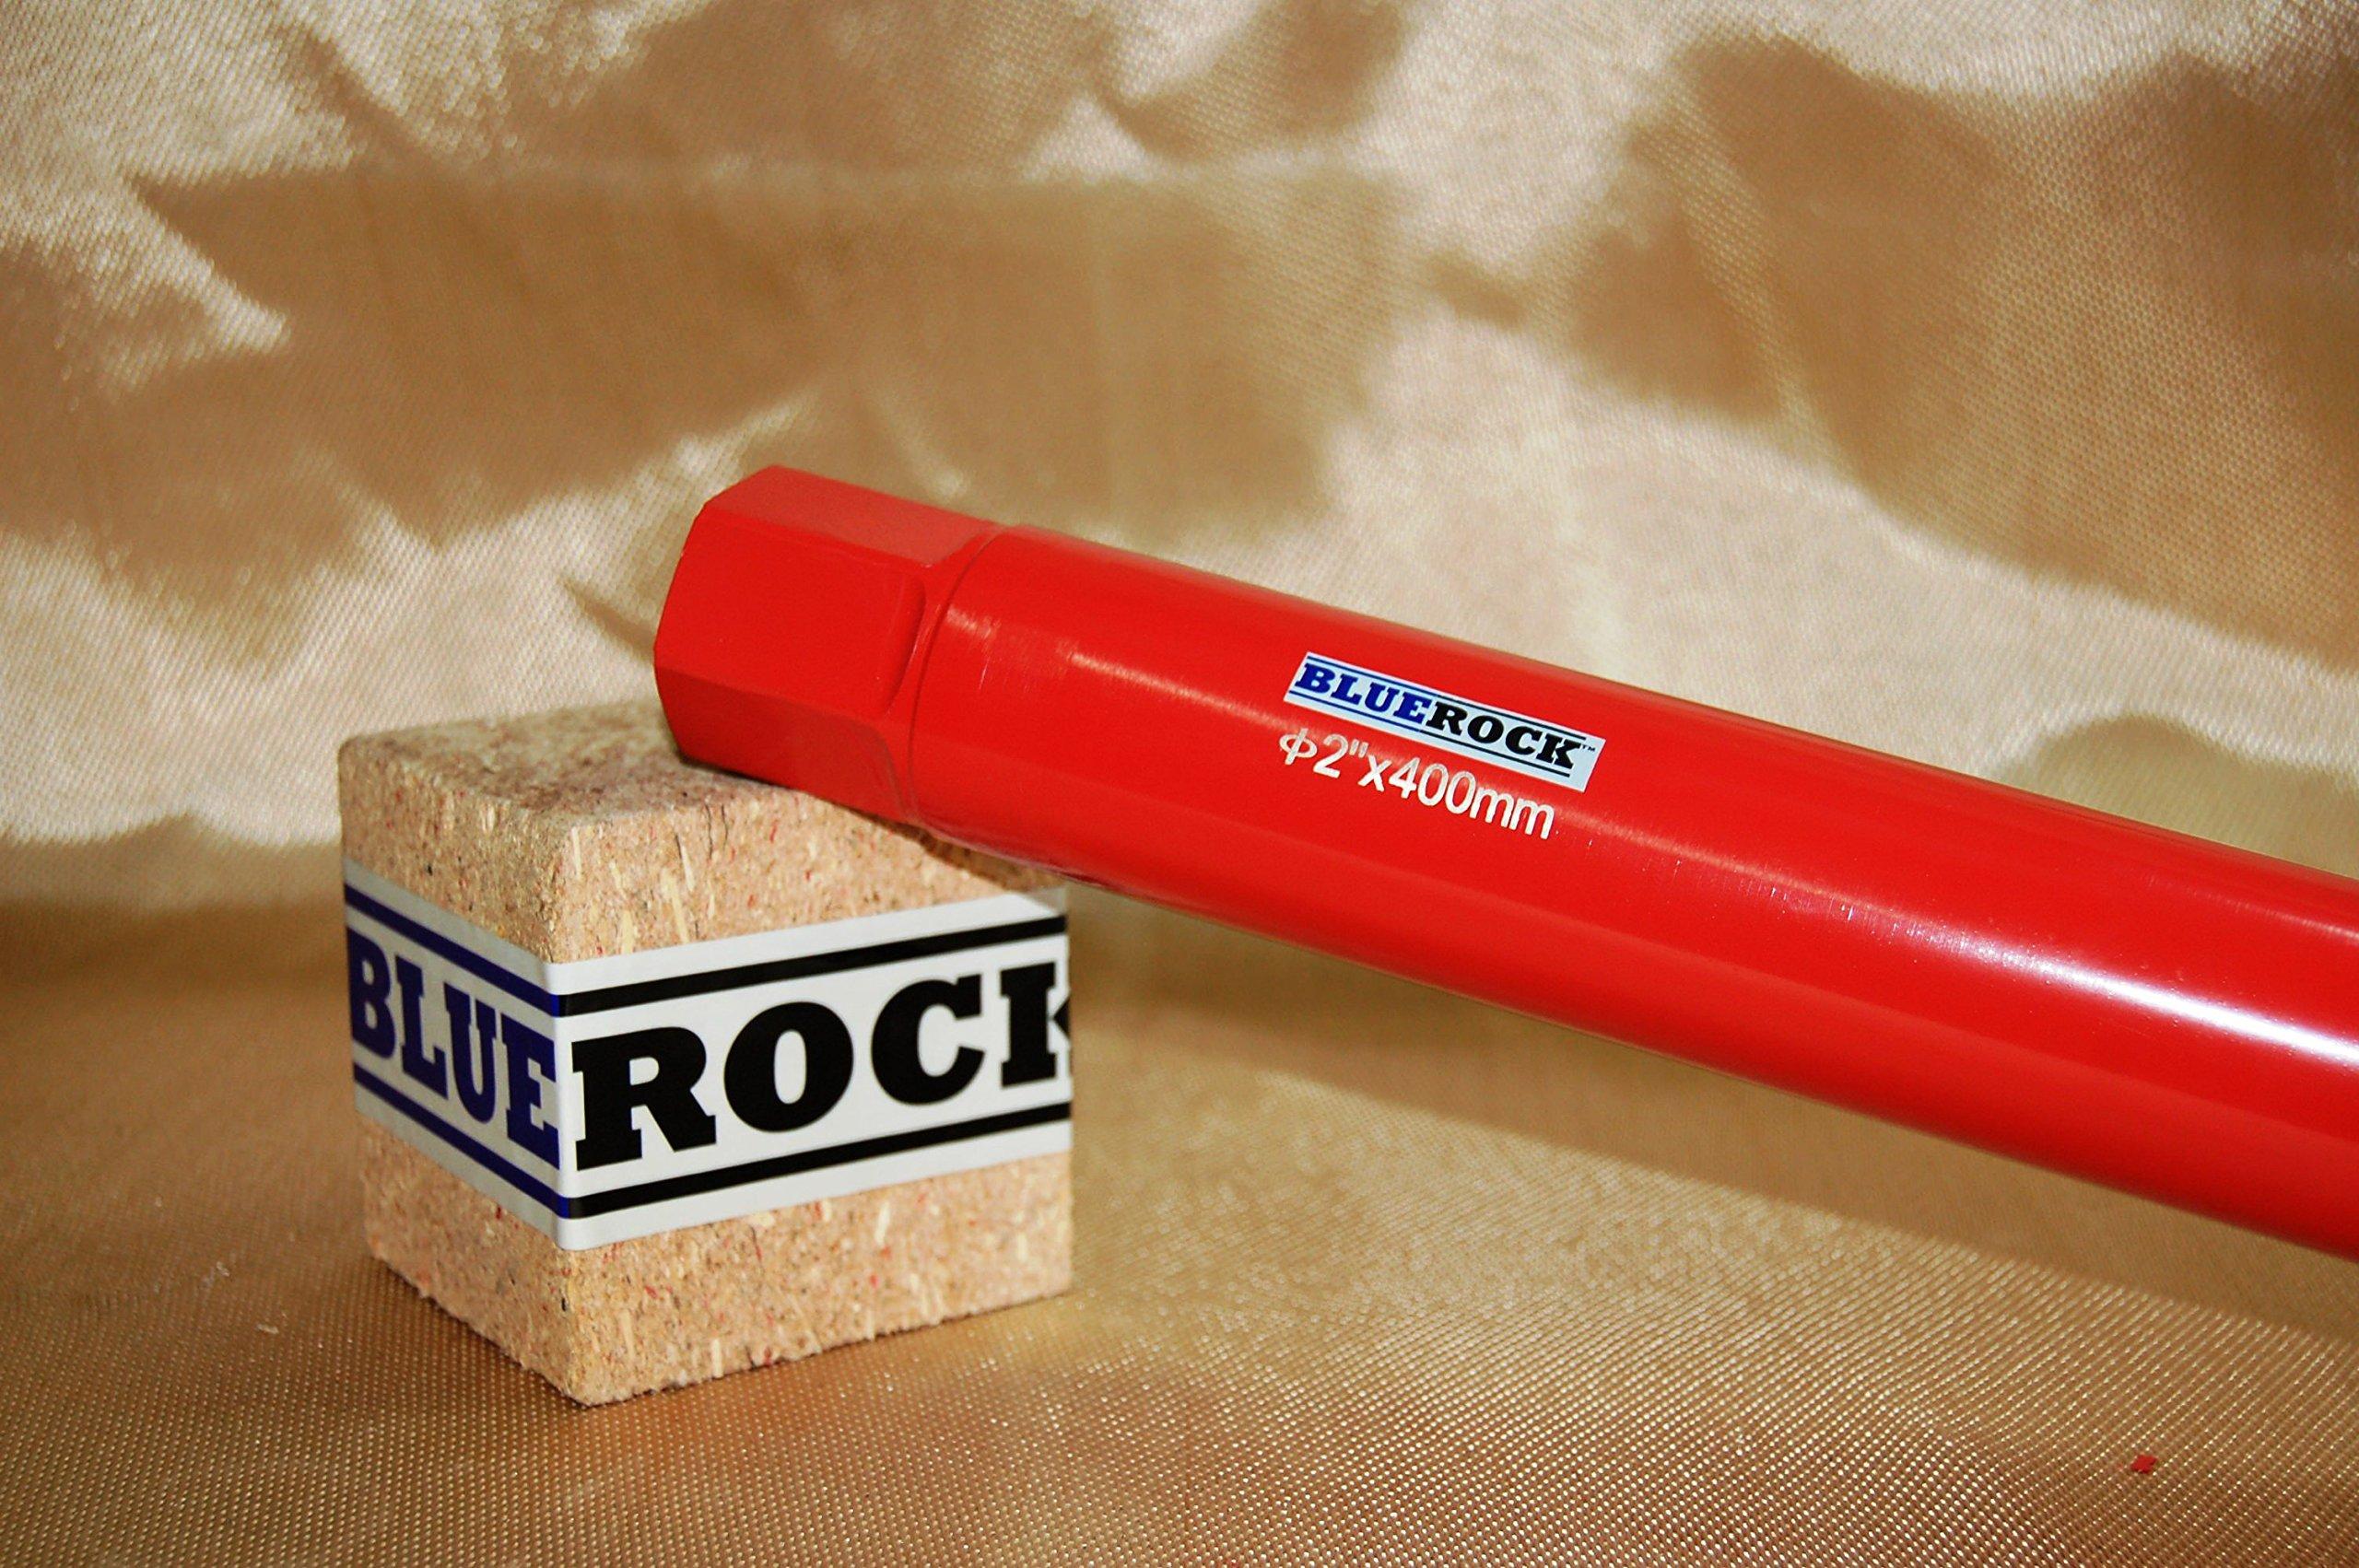 2'' Diamond WET Coring Bit - Concrete Core Drill by BLUEROCK Tools by BLUEROCK